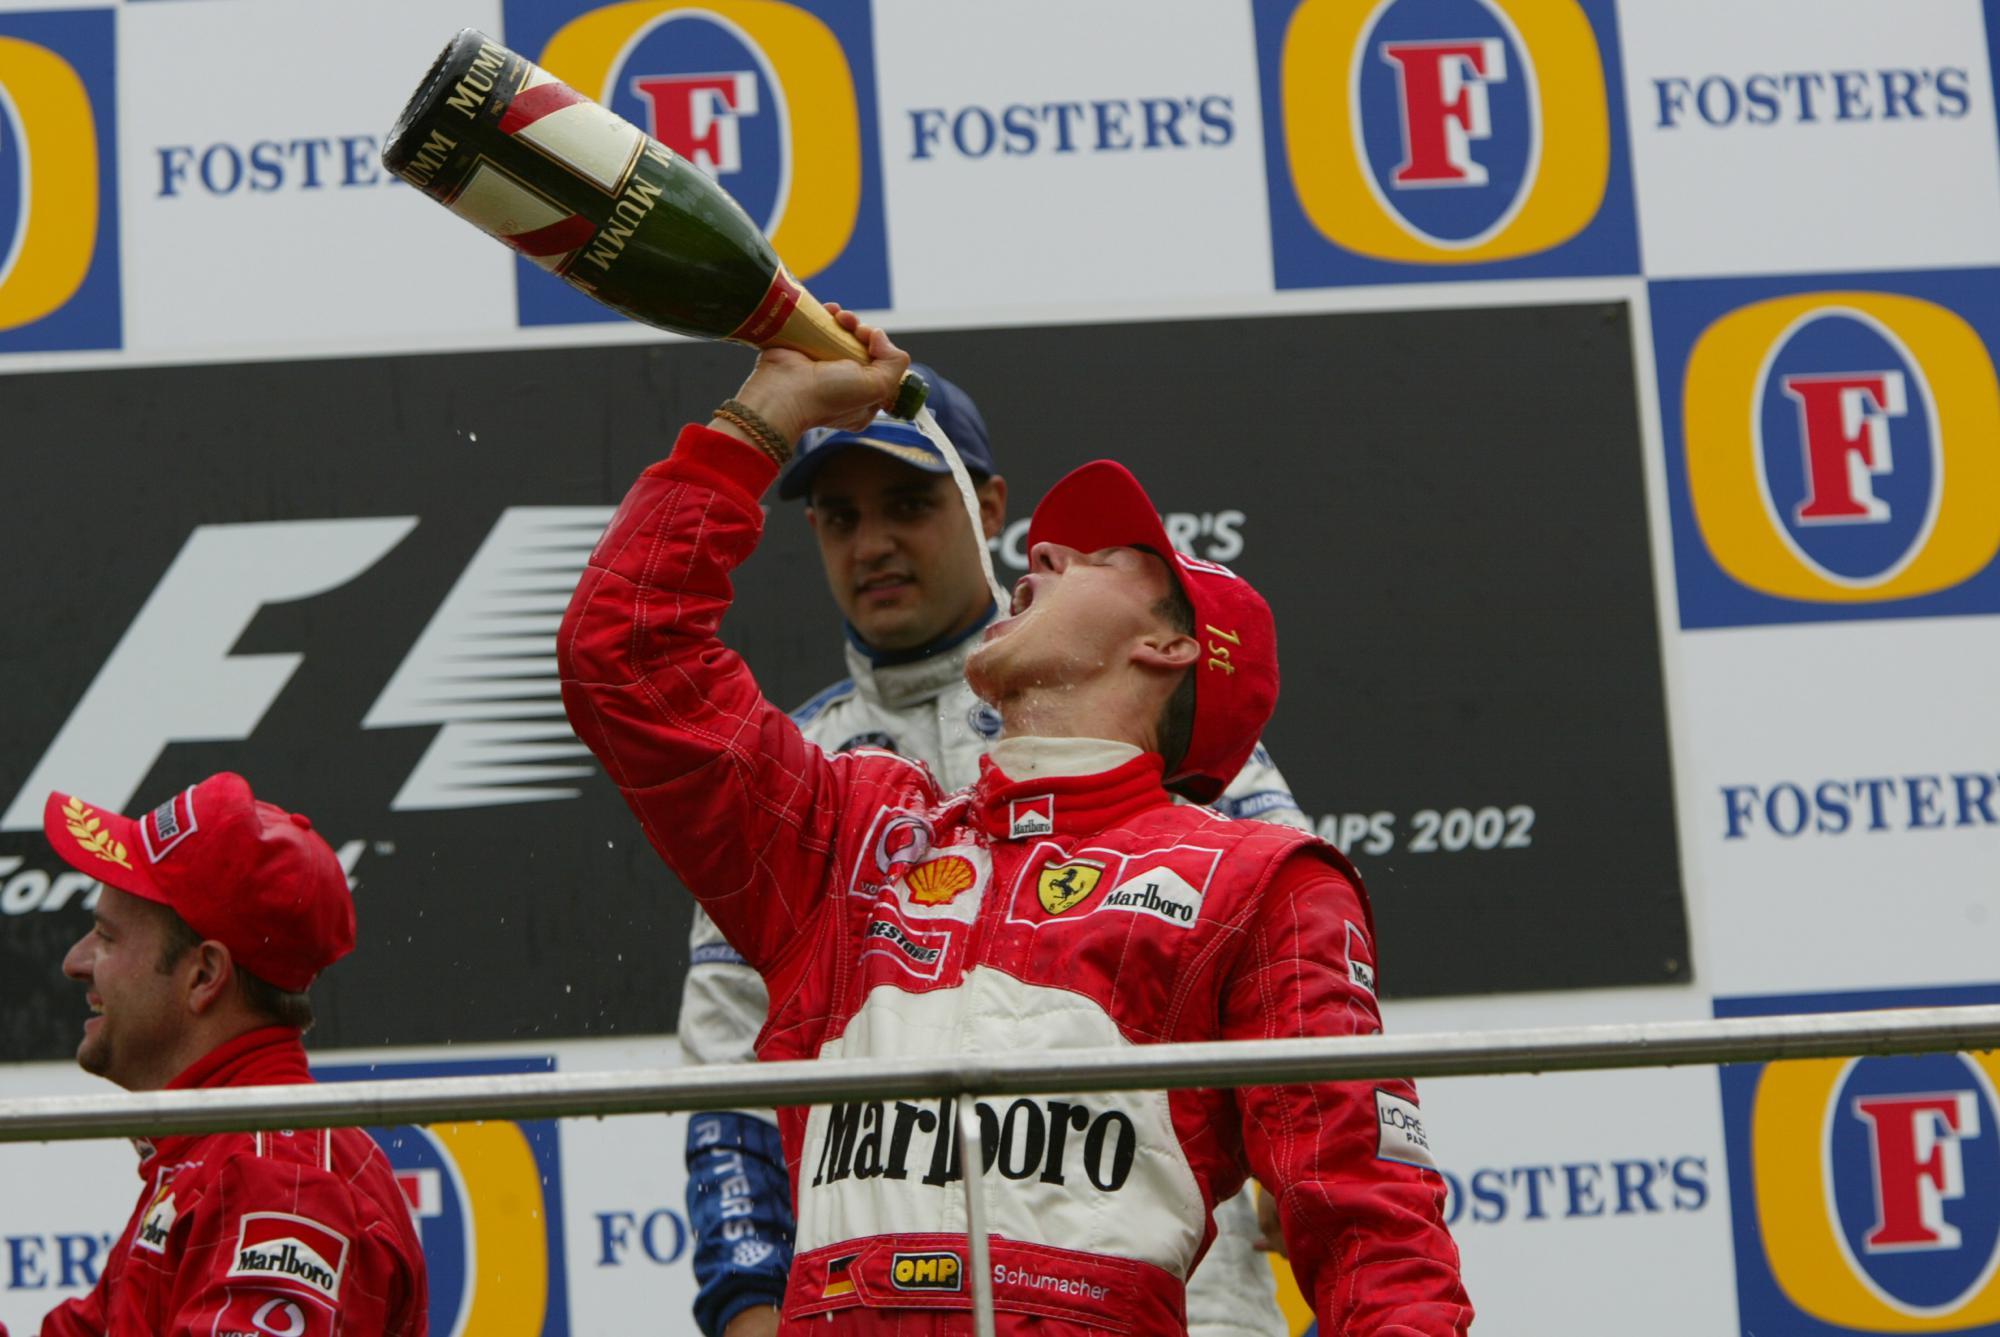 02-Ferrari-31.jpg